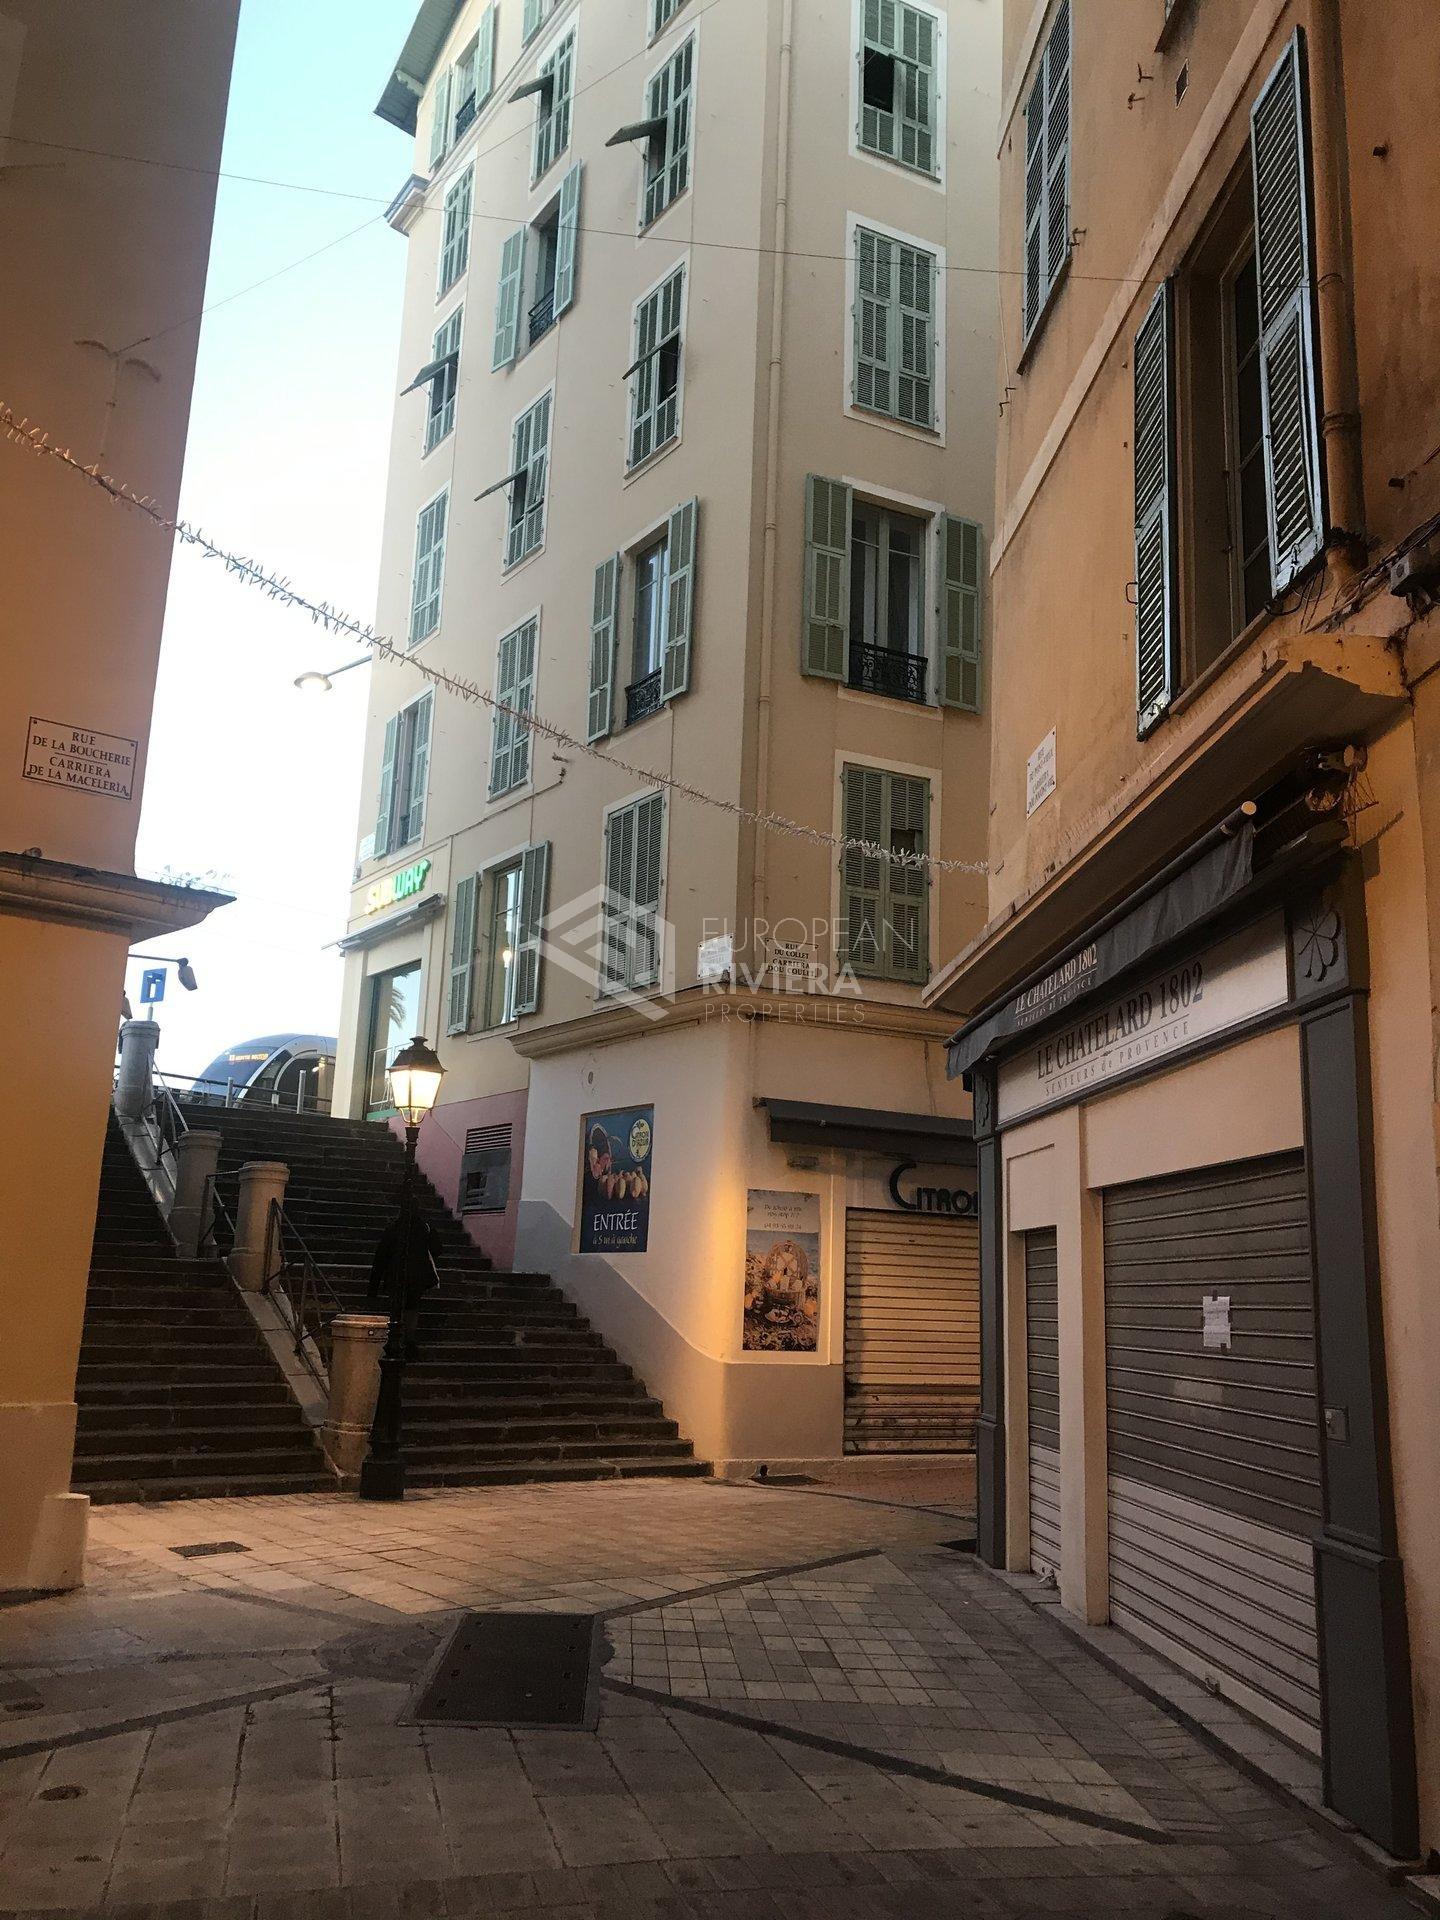 Vendita Avviamento - Nizza (Nice) Vieux Nice